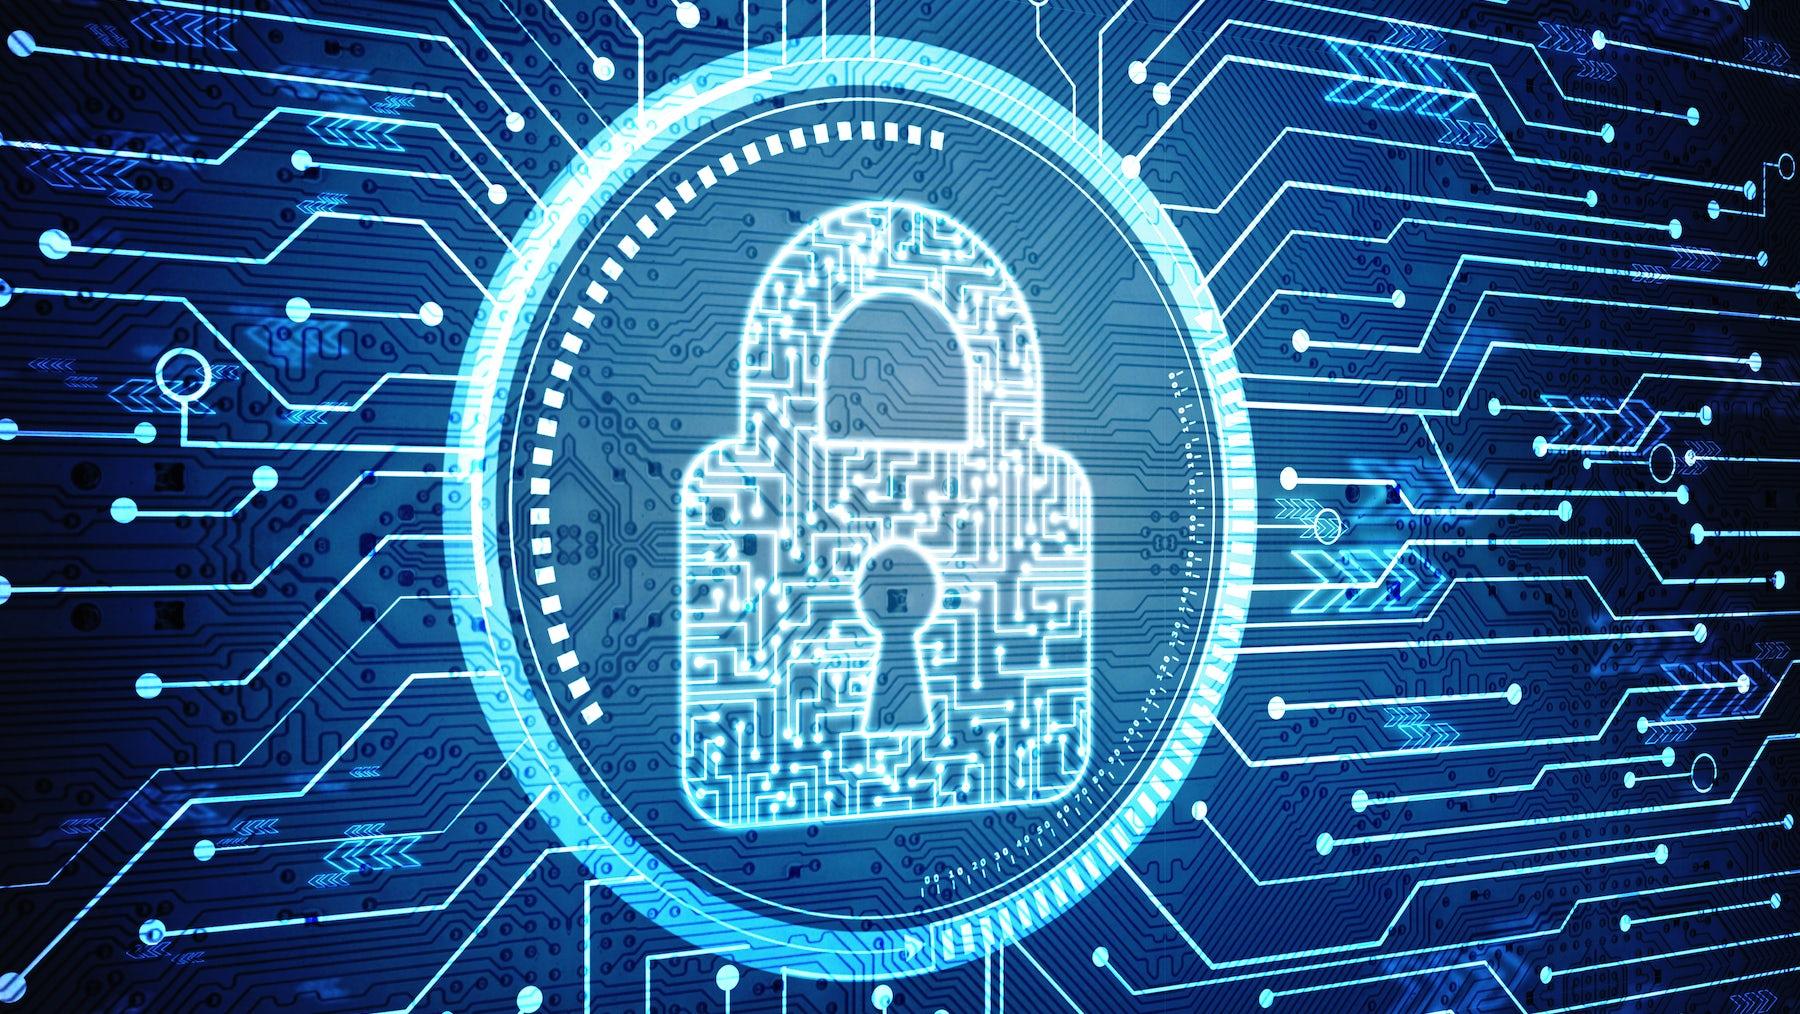 Cybersecurity | Source: Shutterstock